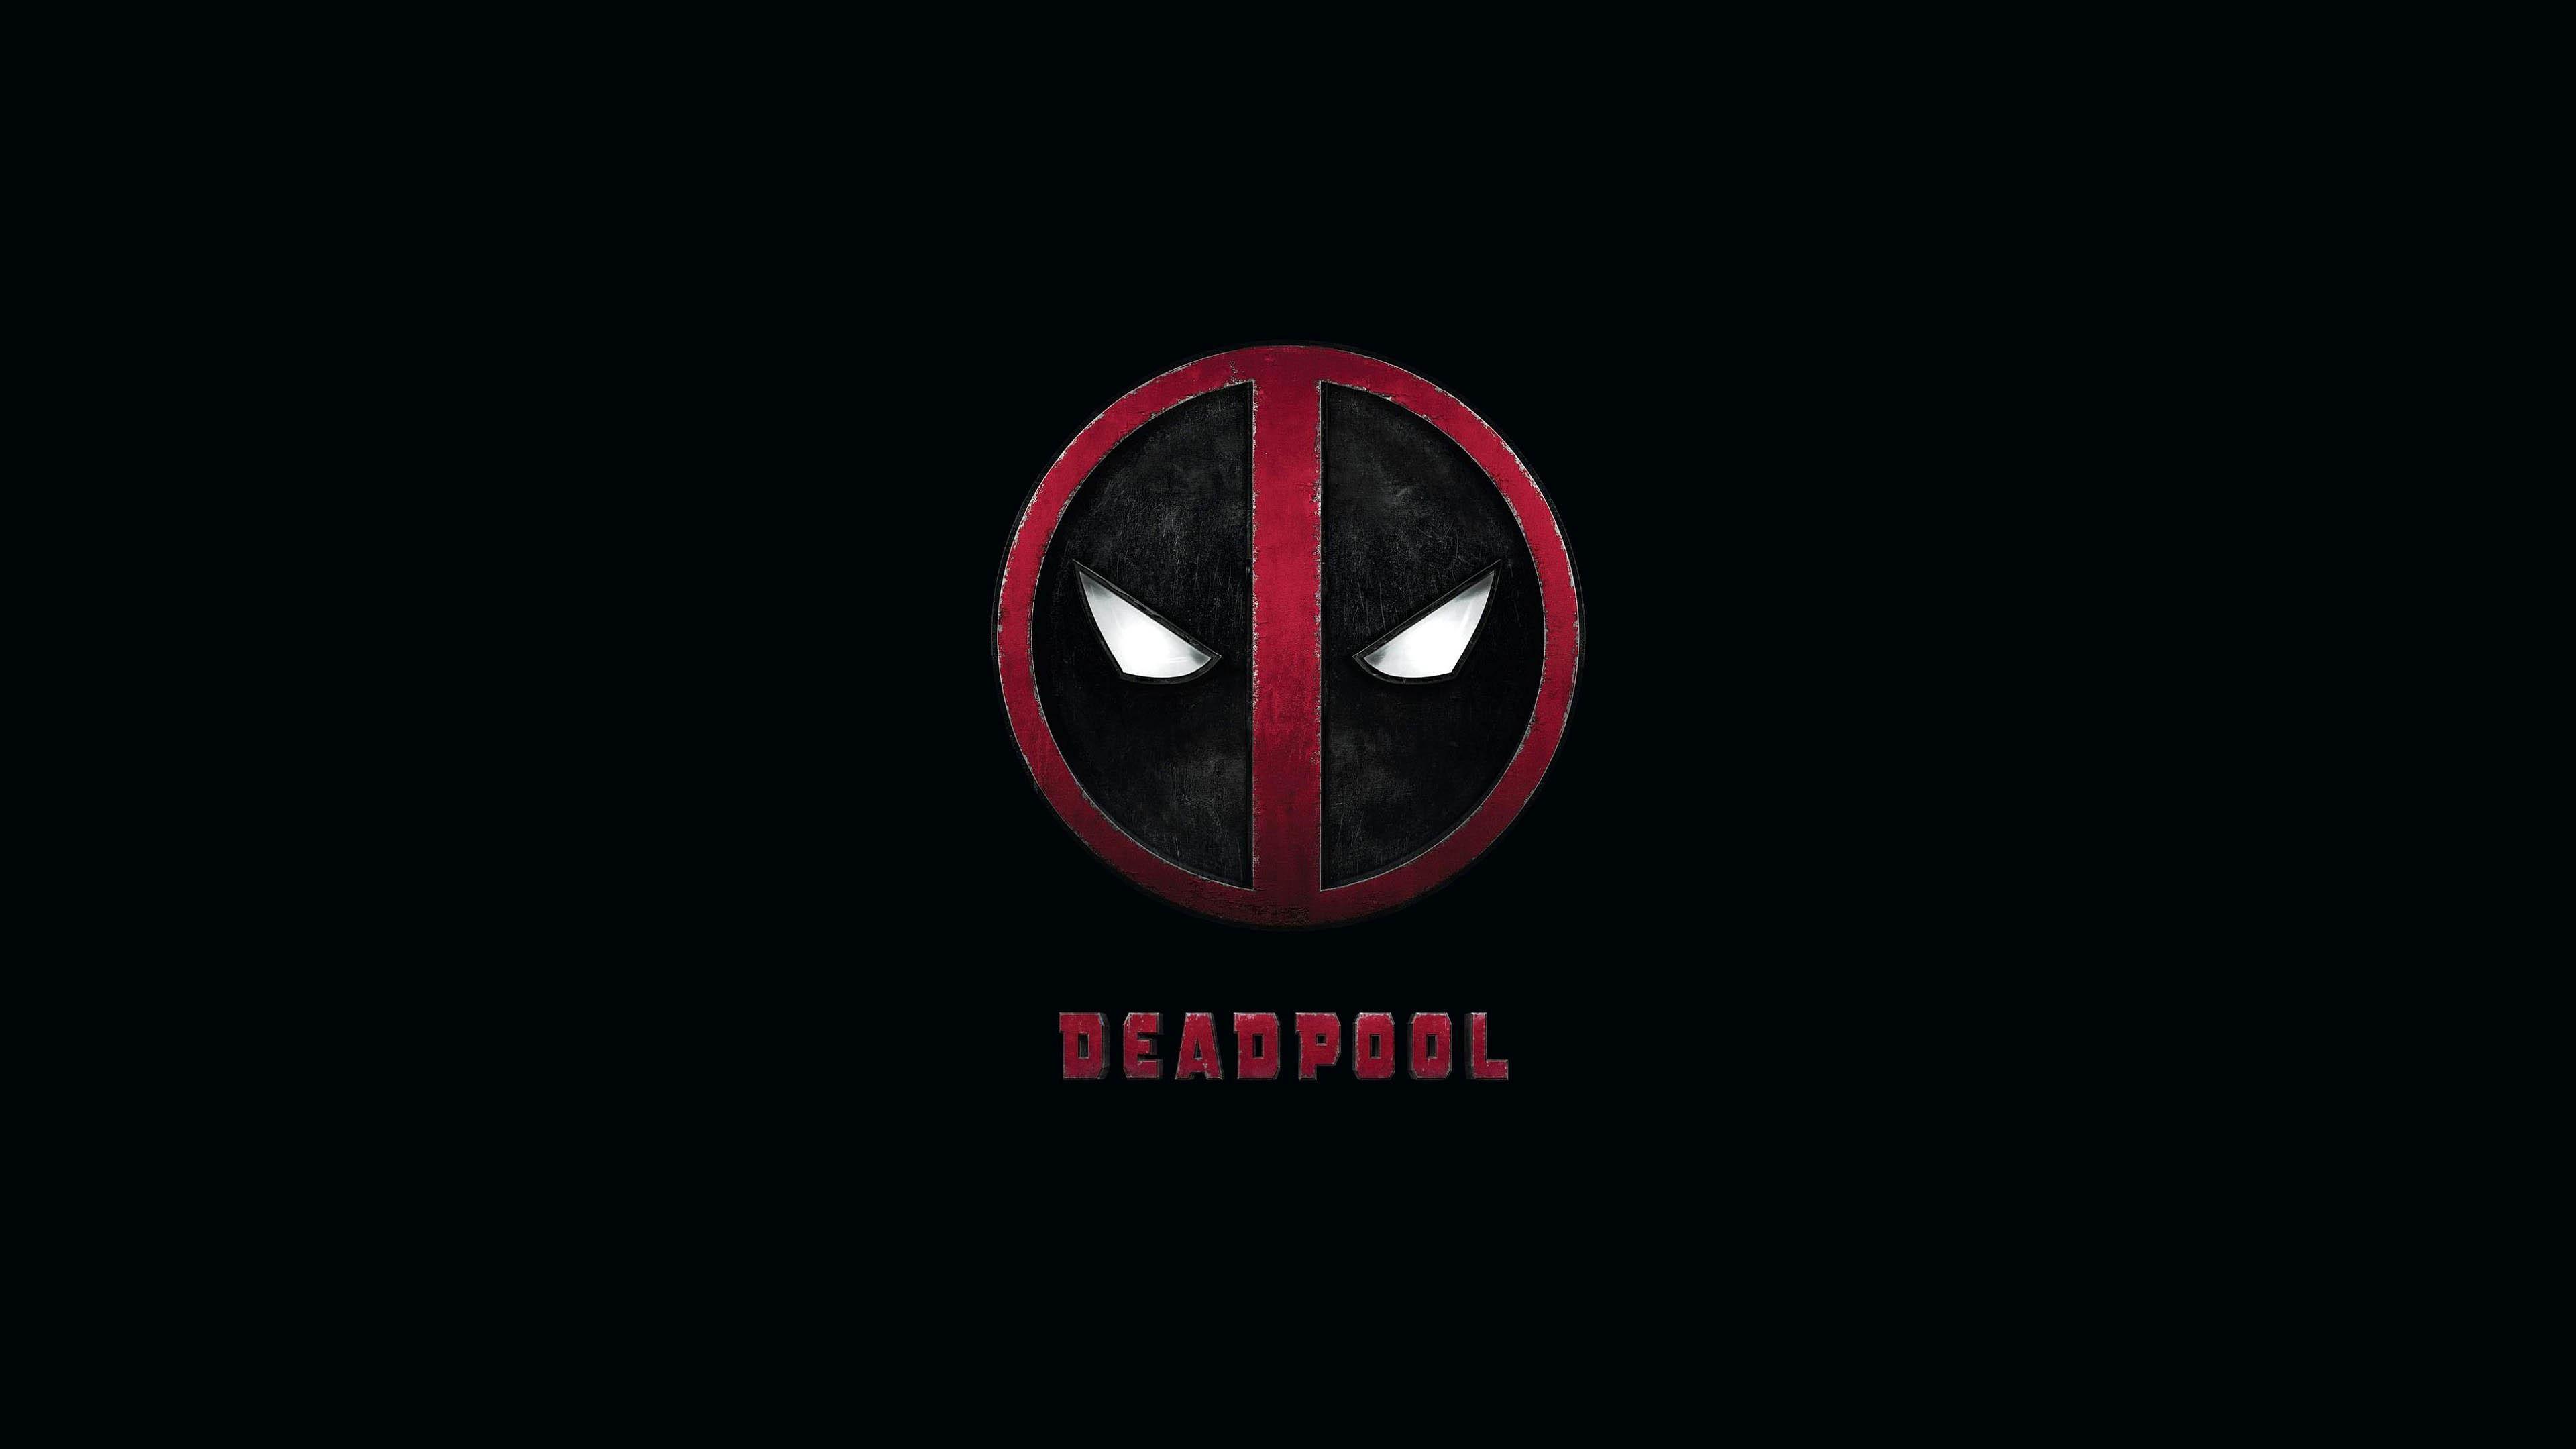 Deadpool Symbol Logo wallpaper